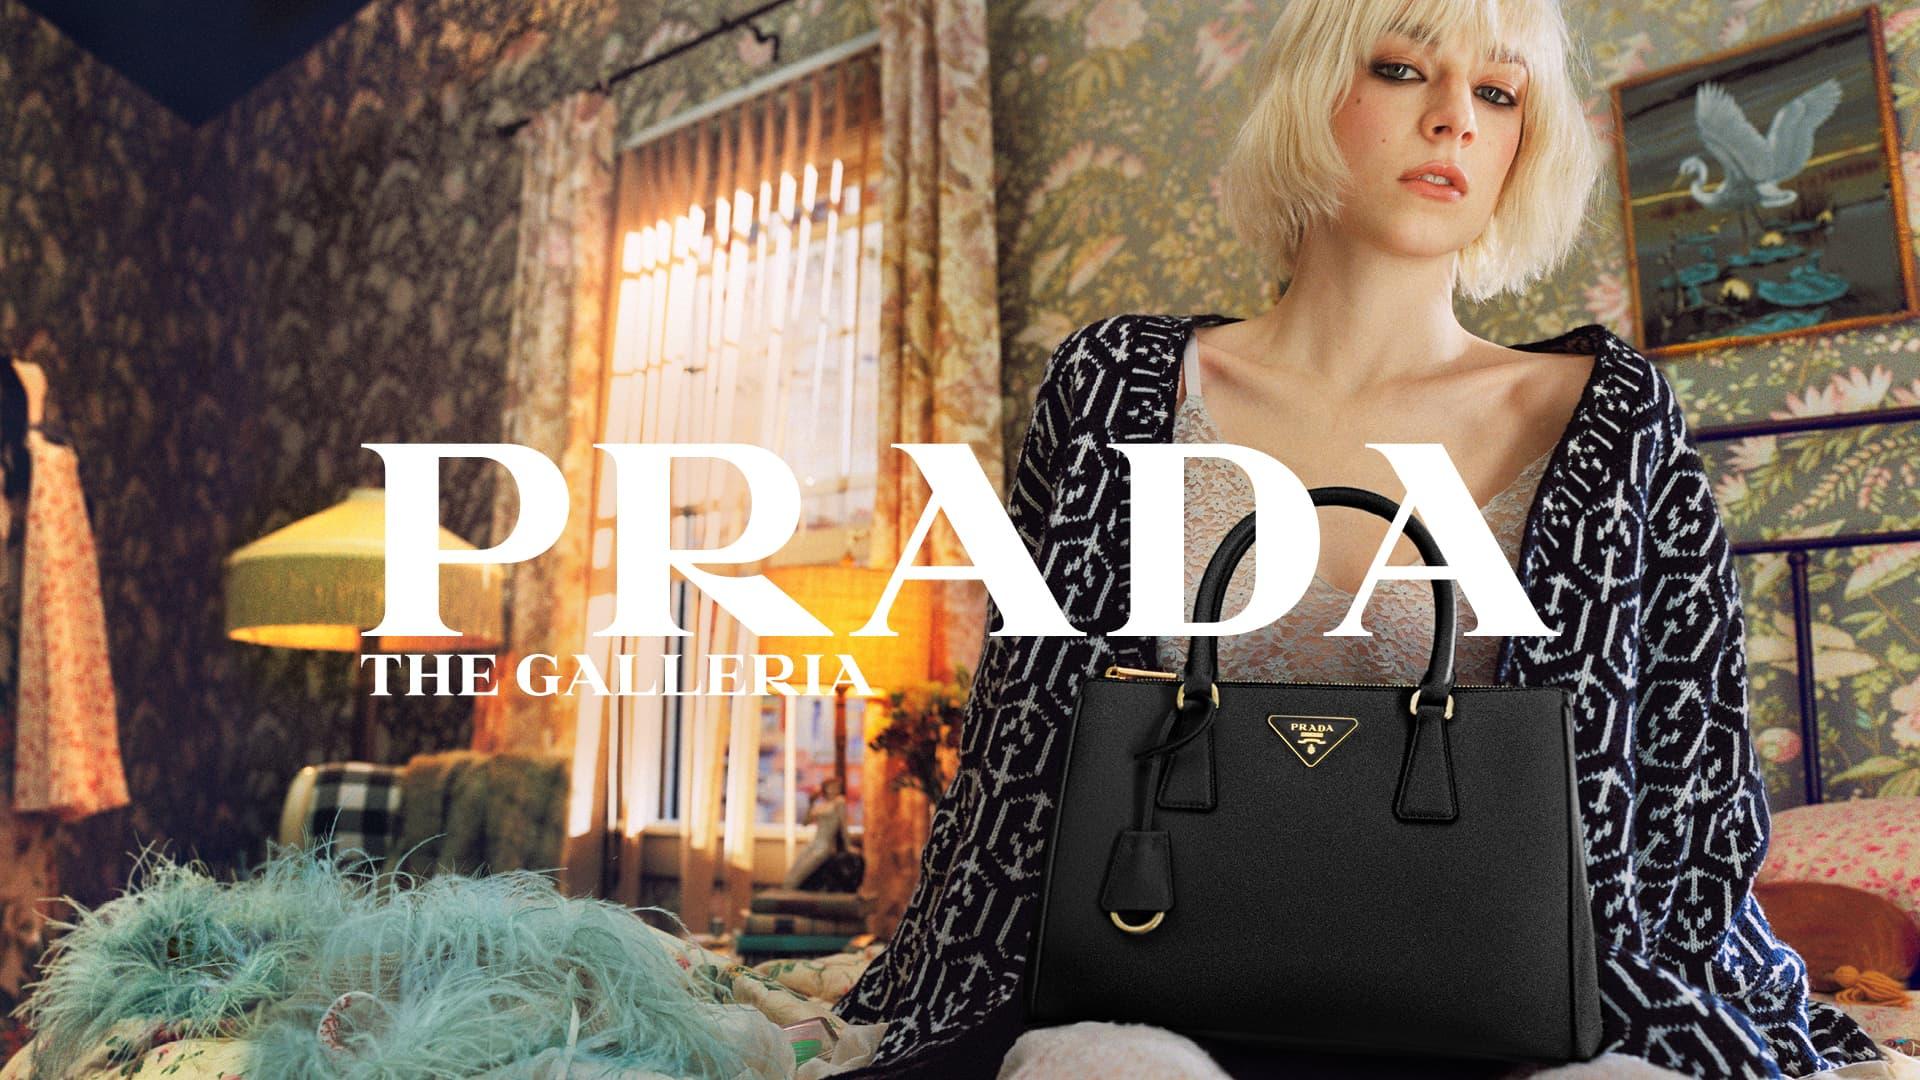 Prada Galleria Spring 2021 Ad Campaign Photos